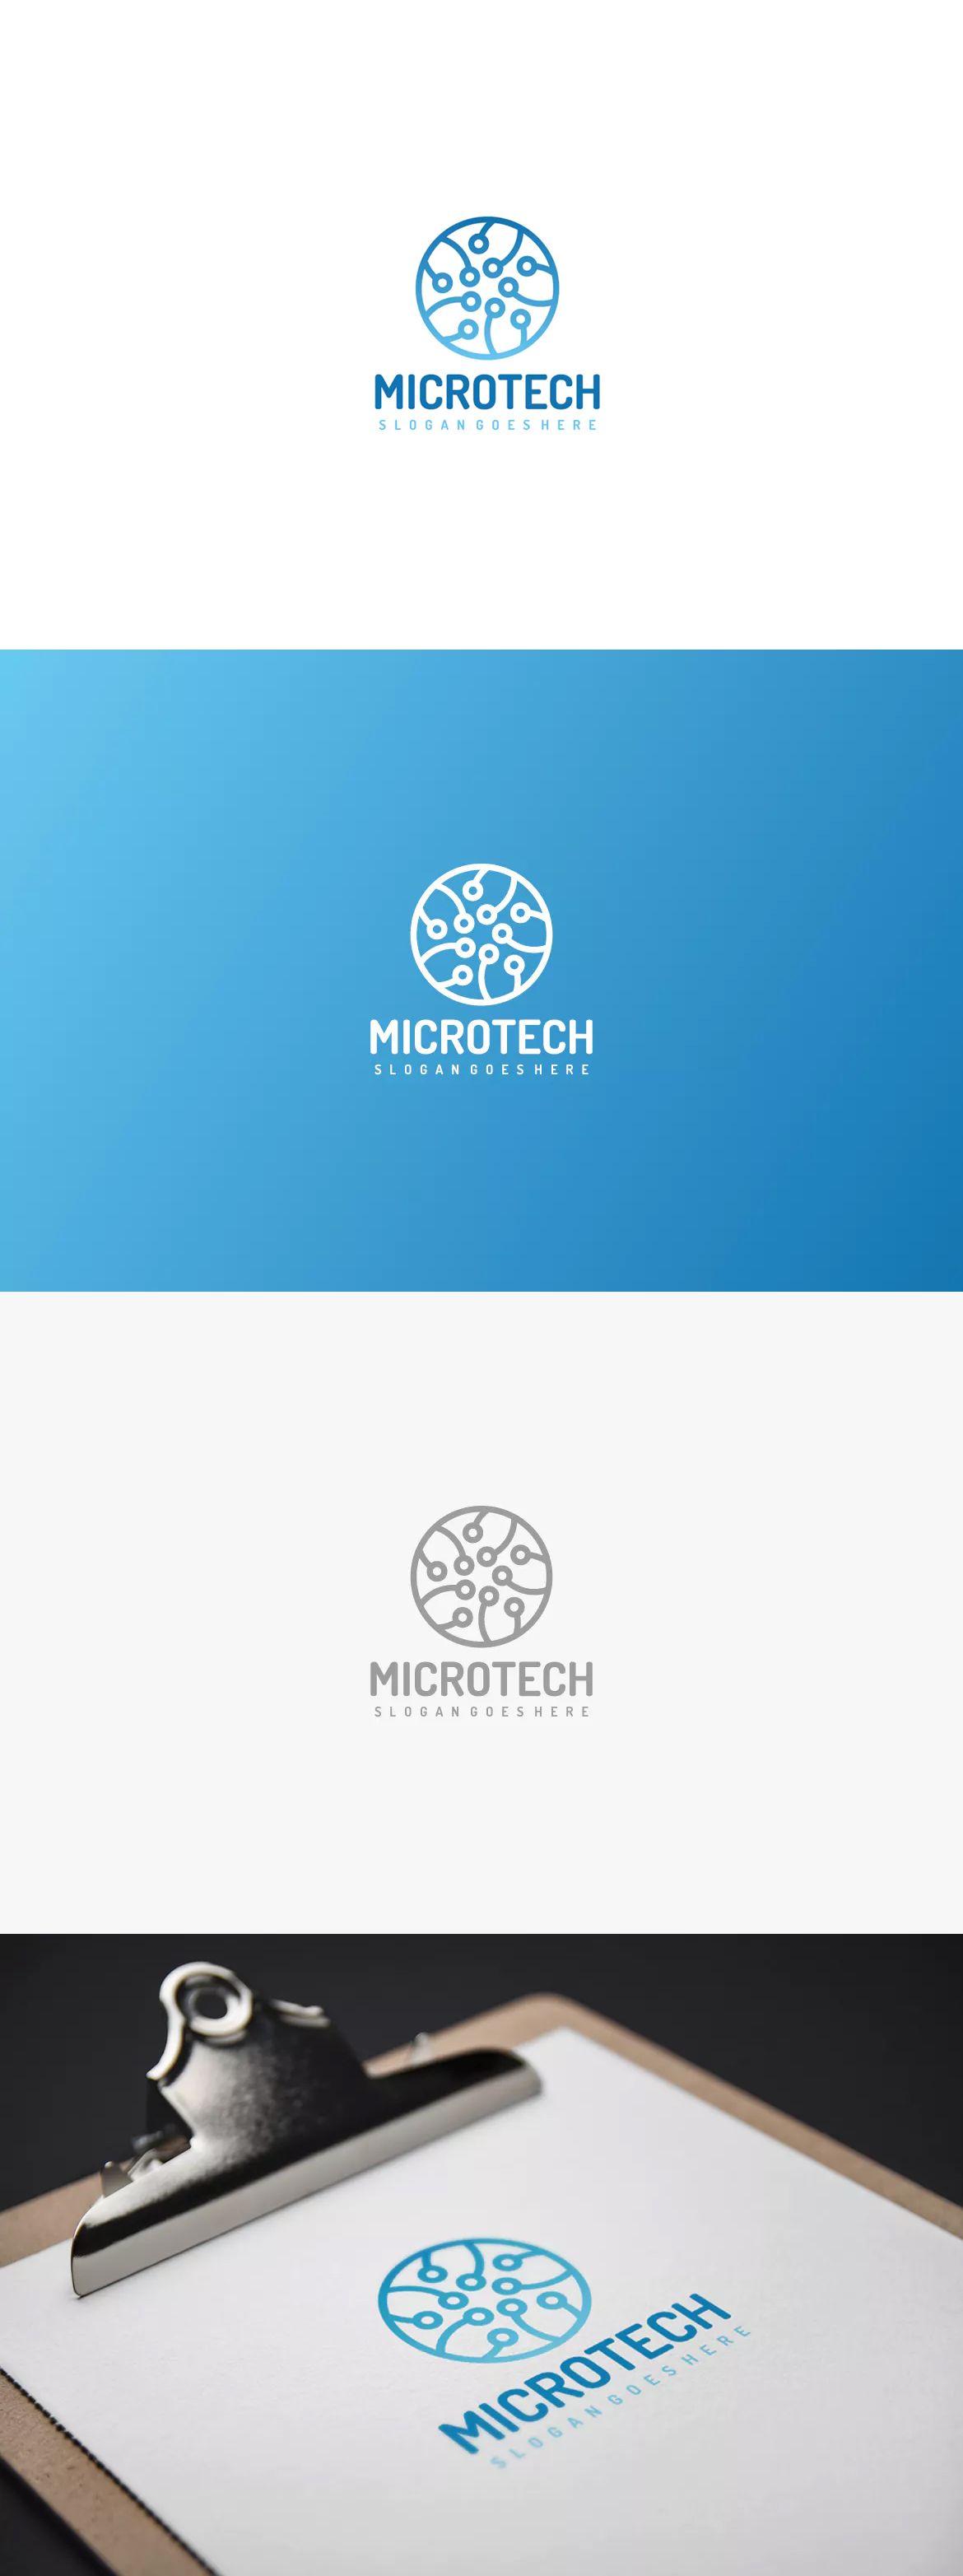 Micro tech logo by 3ab2ou on logo templates logo pen